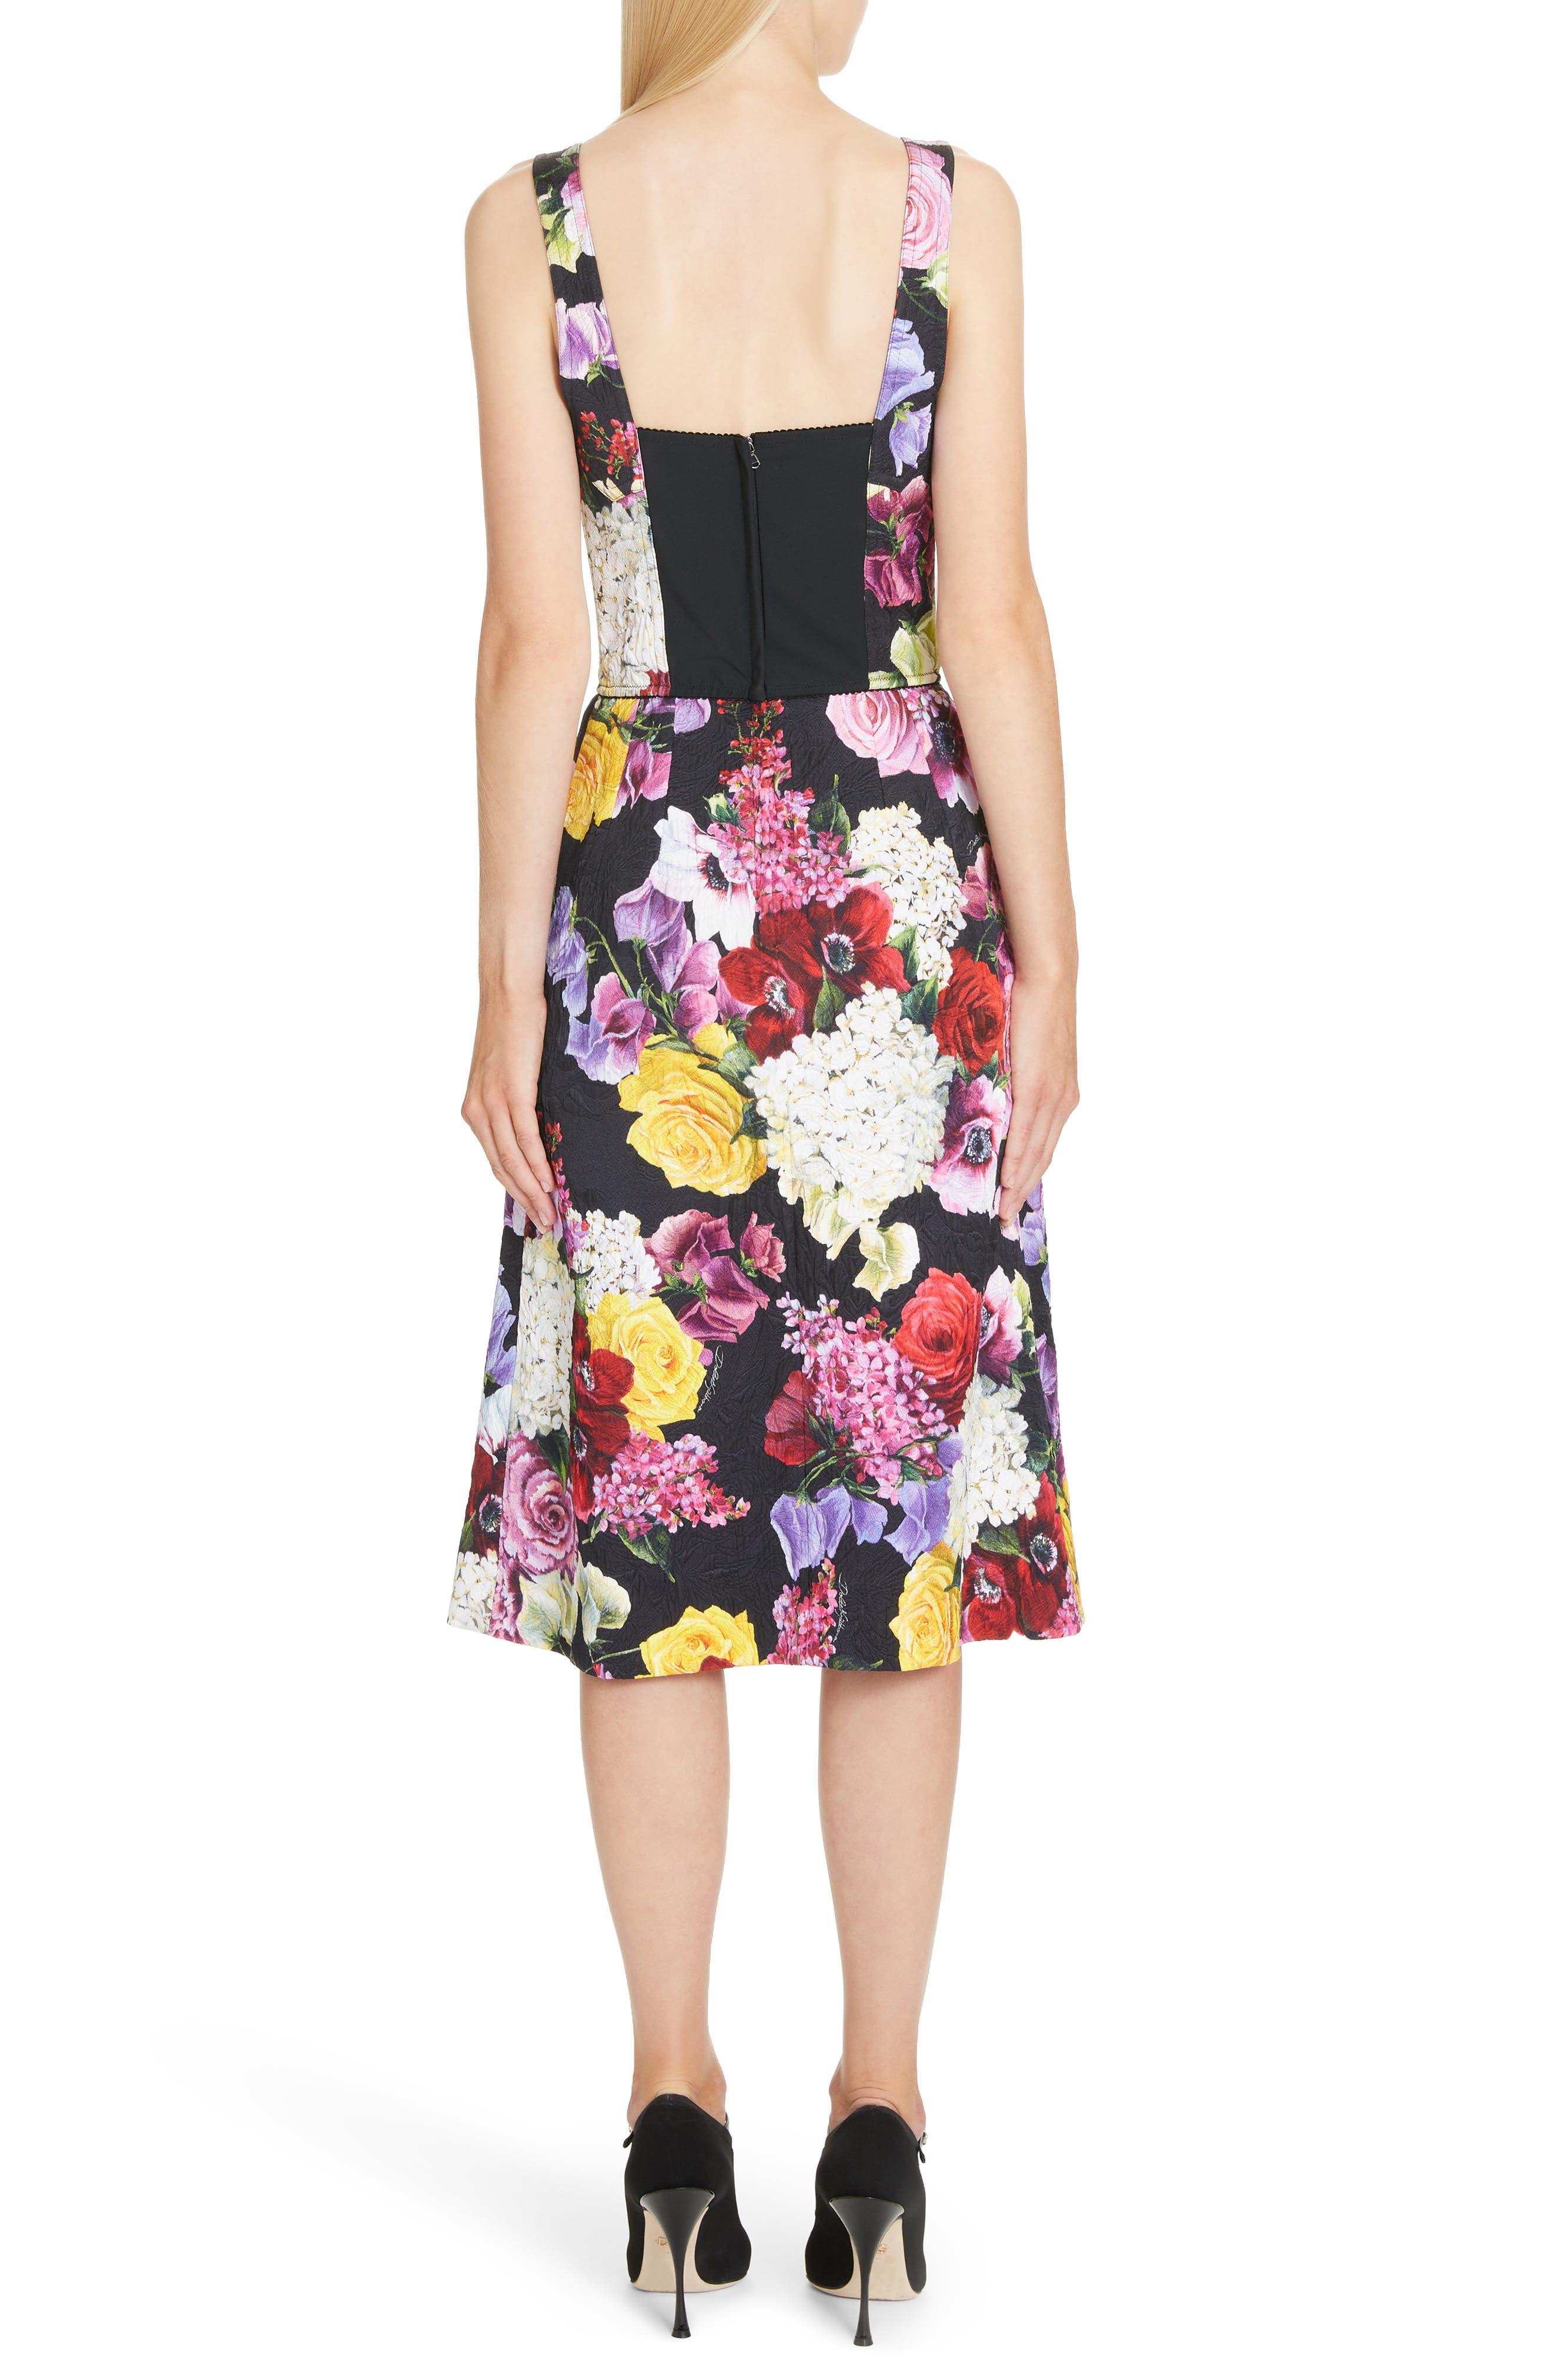 Floral Print Brocade Bustier Dress,                             Alternate thumbnail 2, color,                             HNW86 BLACK FLORAL